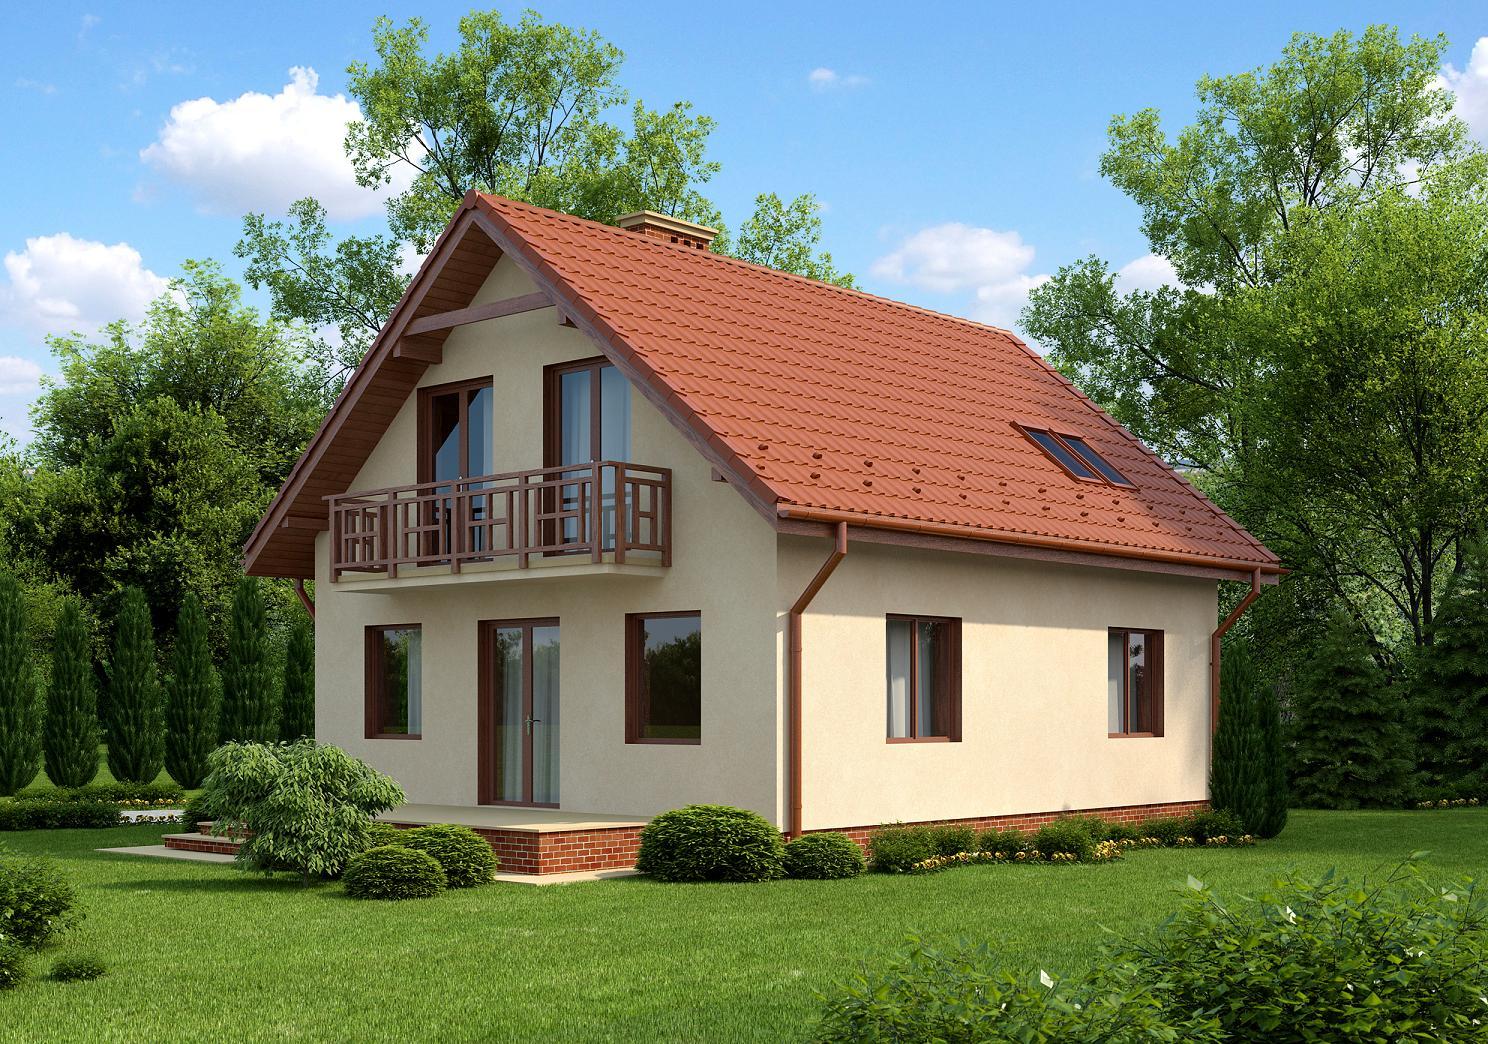 Частные дома дизайн снаружи